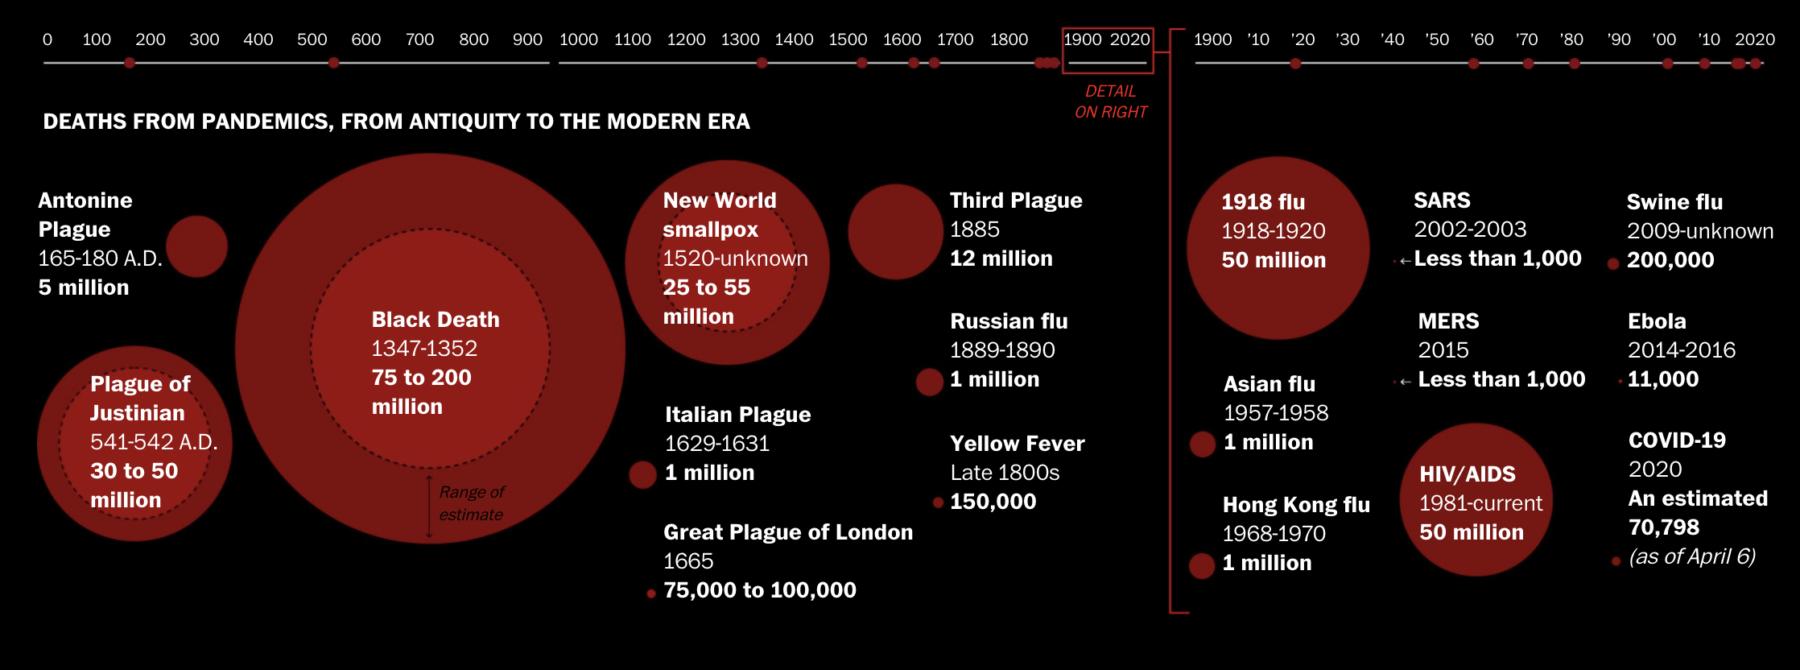 Timeline of History's Deadliest Pandemics 2